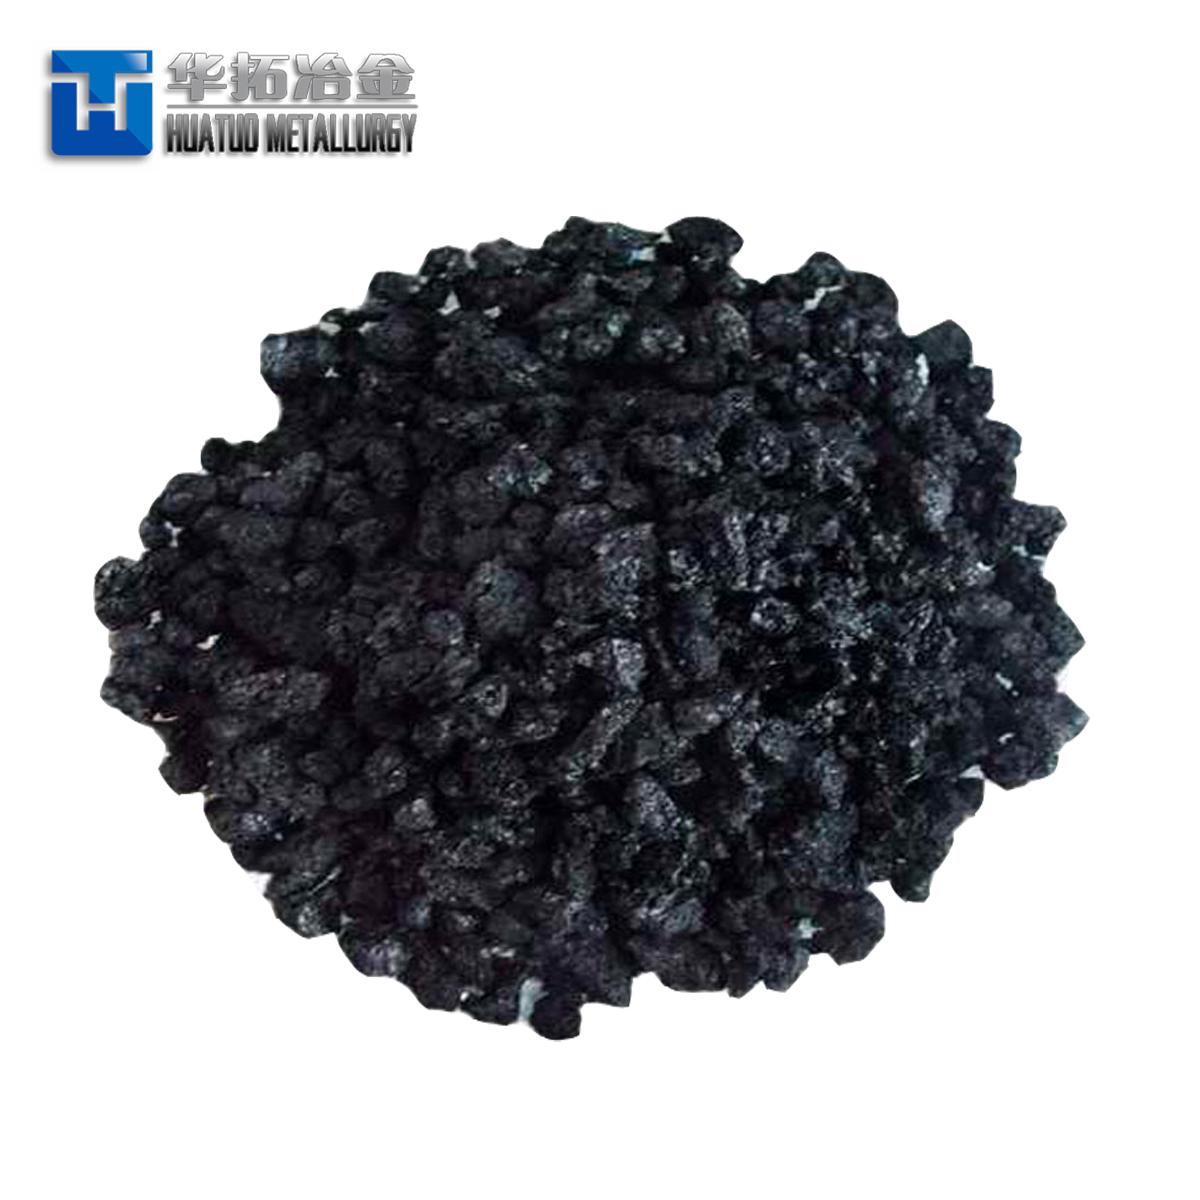 98.5% Graphite Petroleum Coke Powder Recarburizer